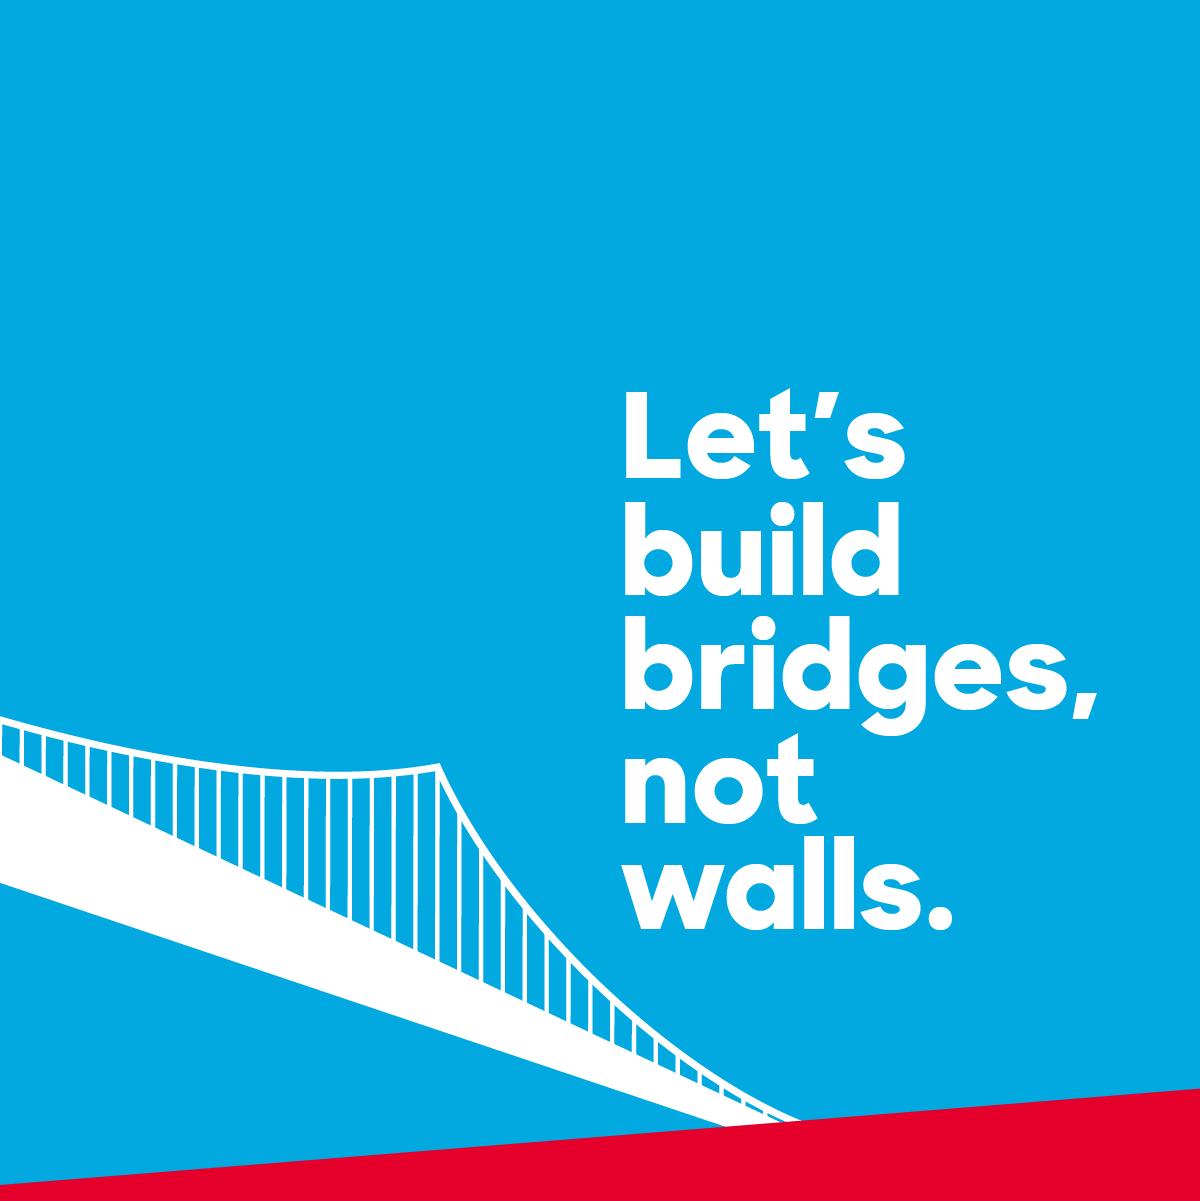 infrastructure-build-bridge-fb-052516b.png